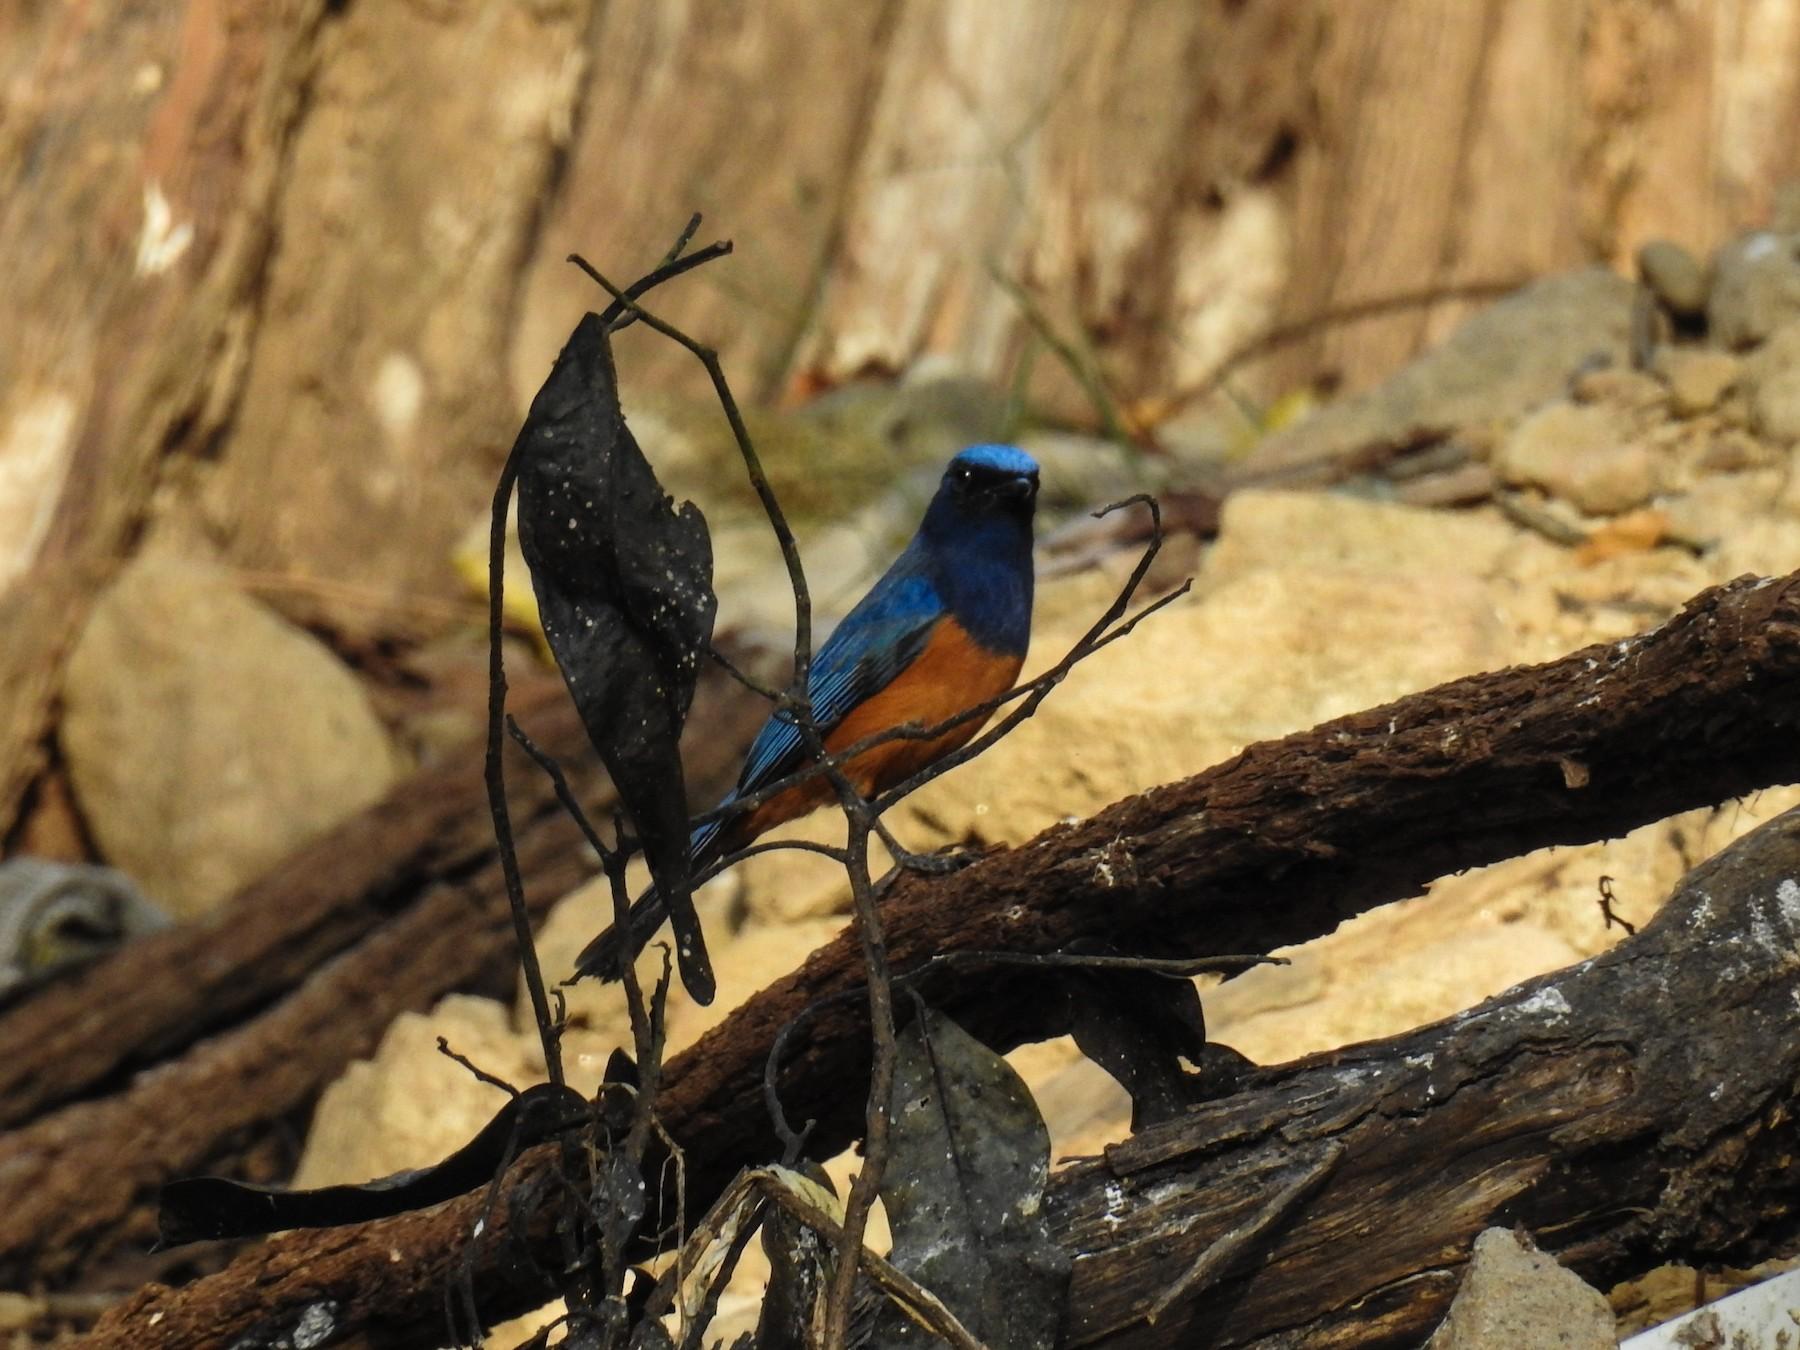 Timor Blue Flycatcher - Pam Rasmussen